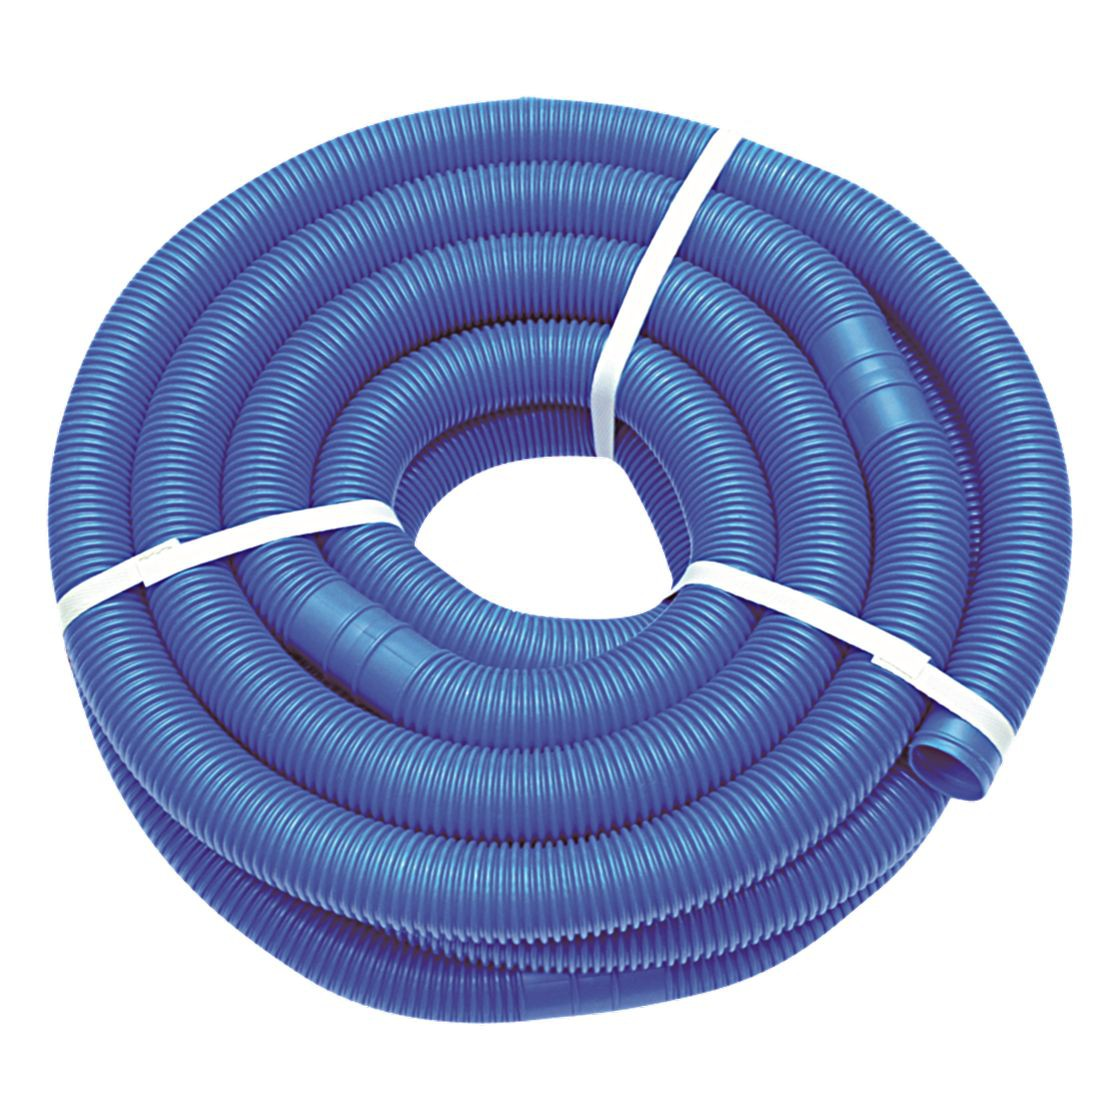 Comprare jilong pool hose 32 tubo flessibile per piscina for Comprare piscina